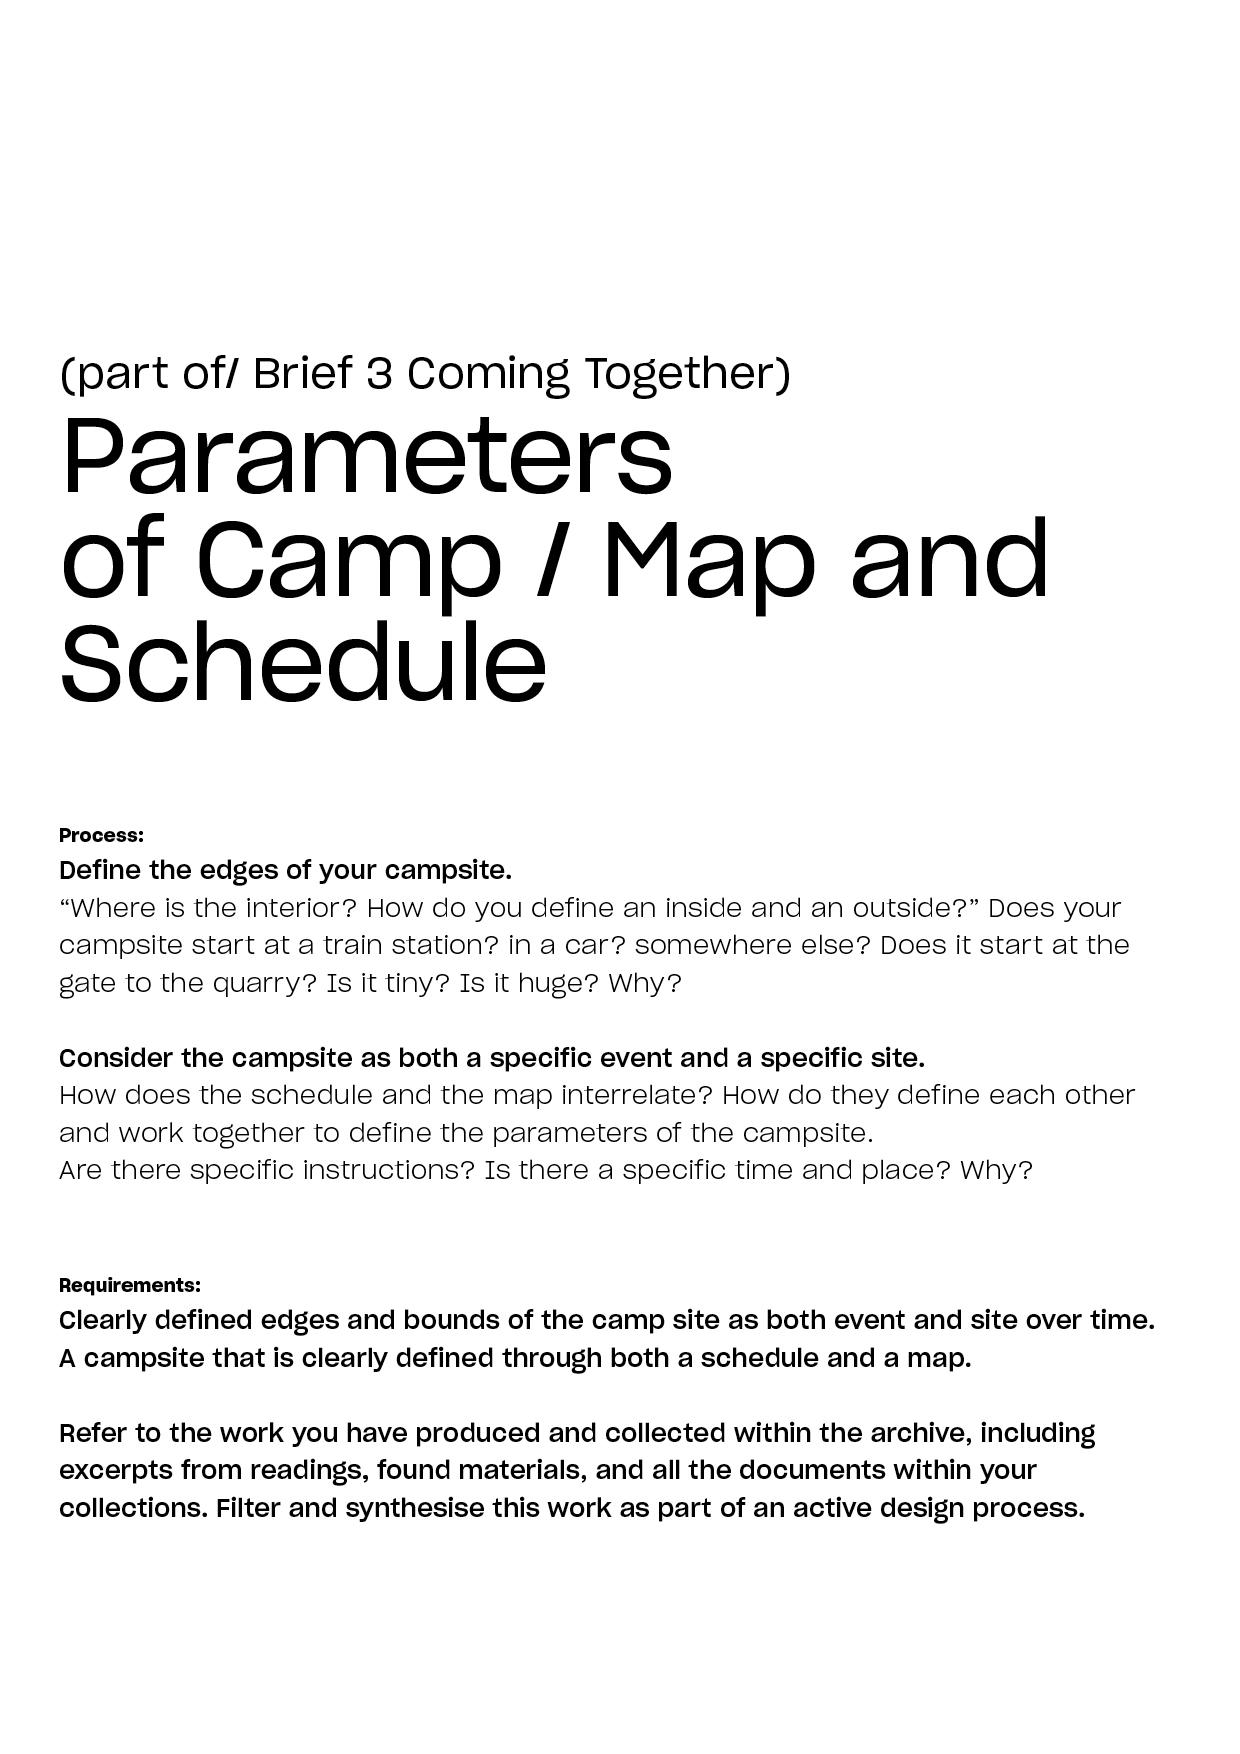 Brief_Counter-Culture-Camp-Ground_0119.jpg